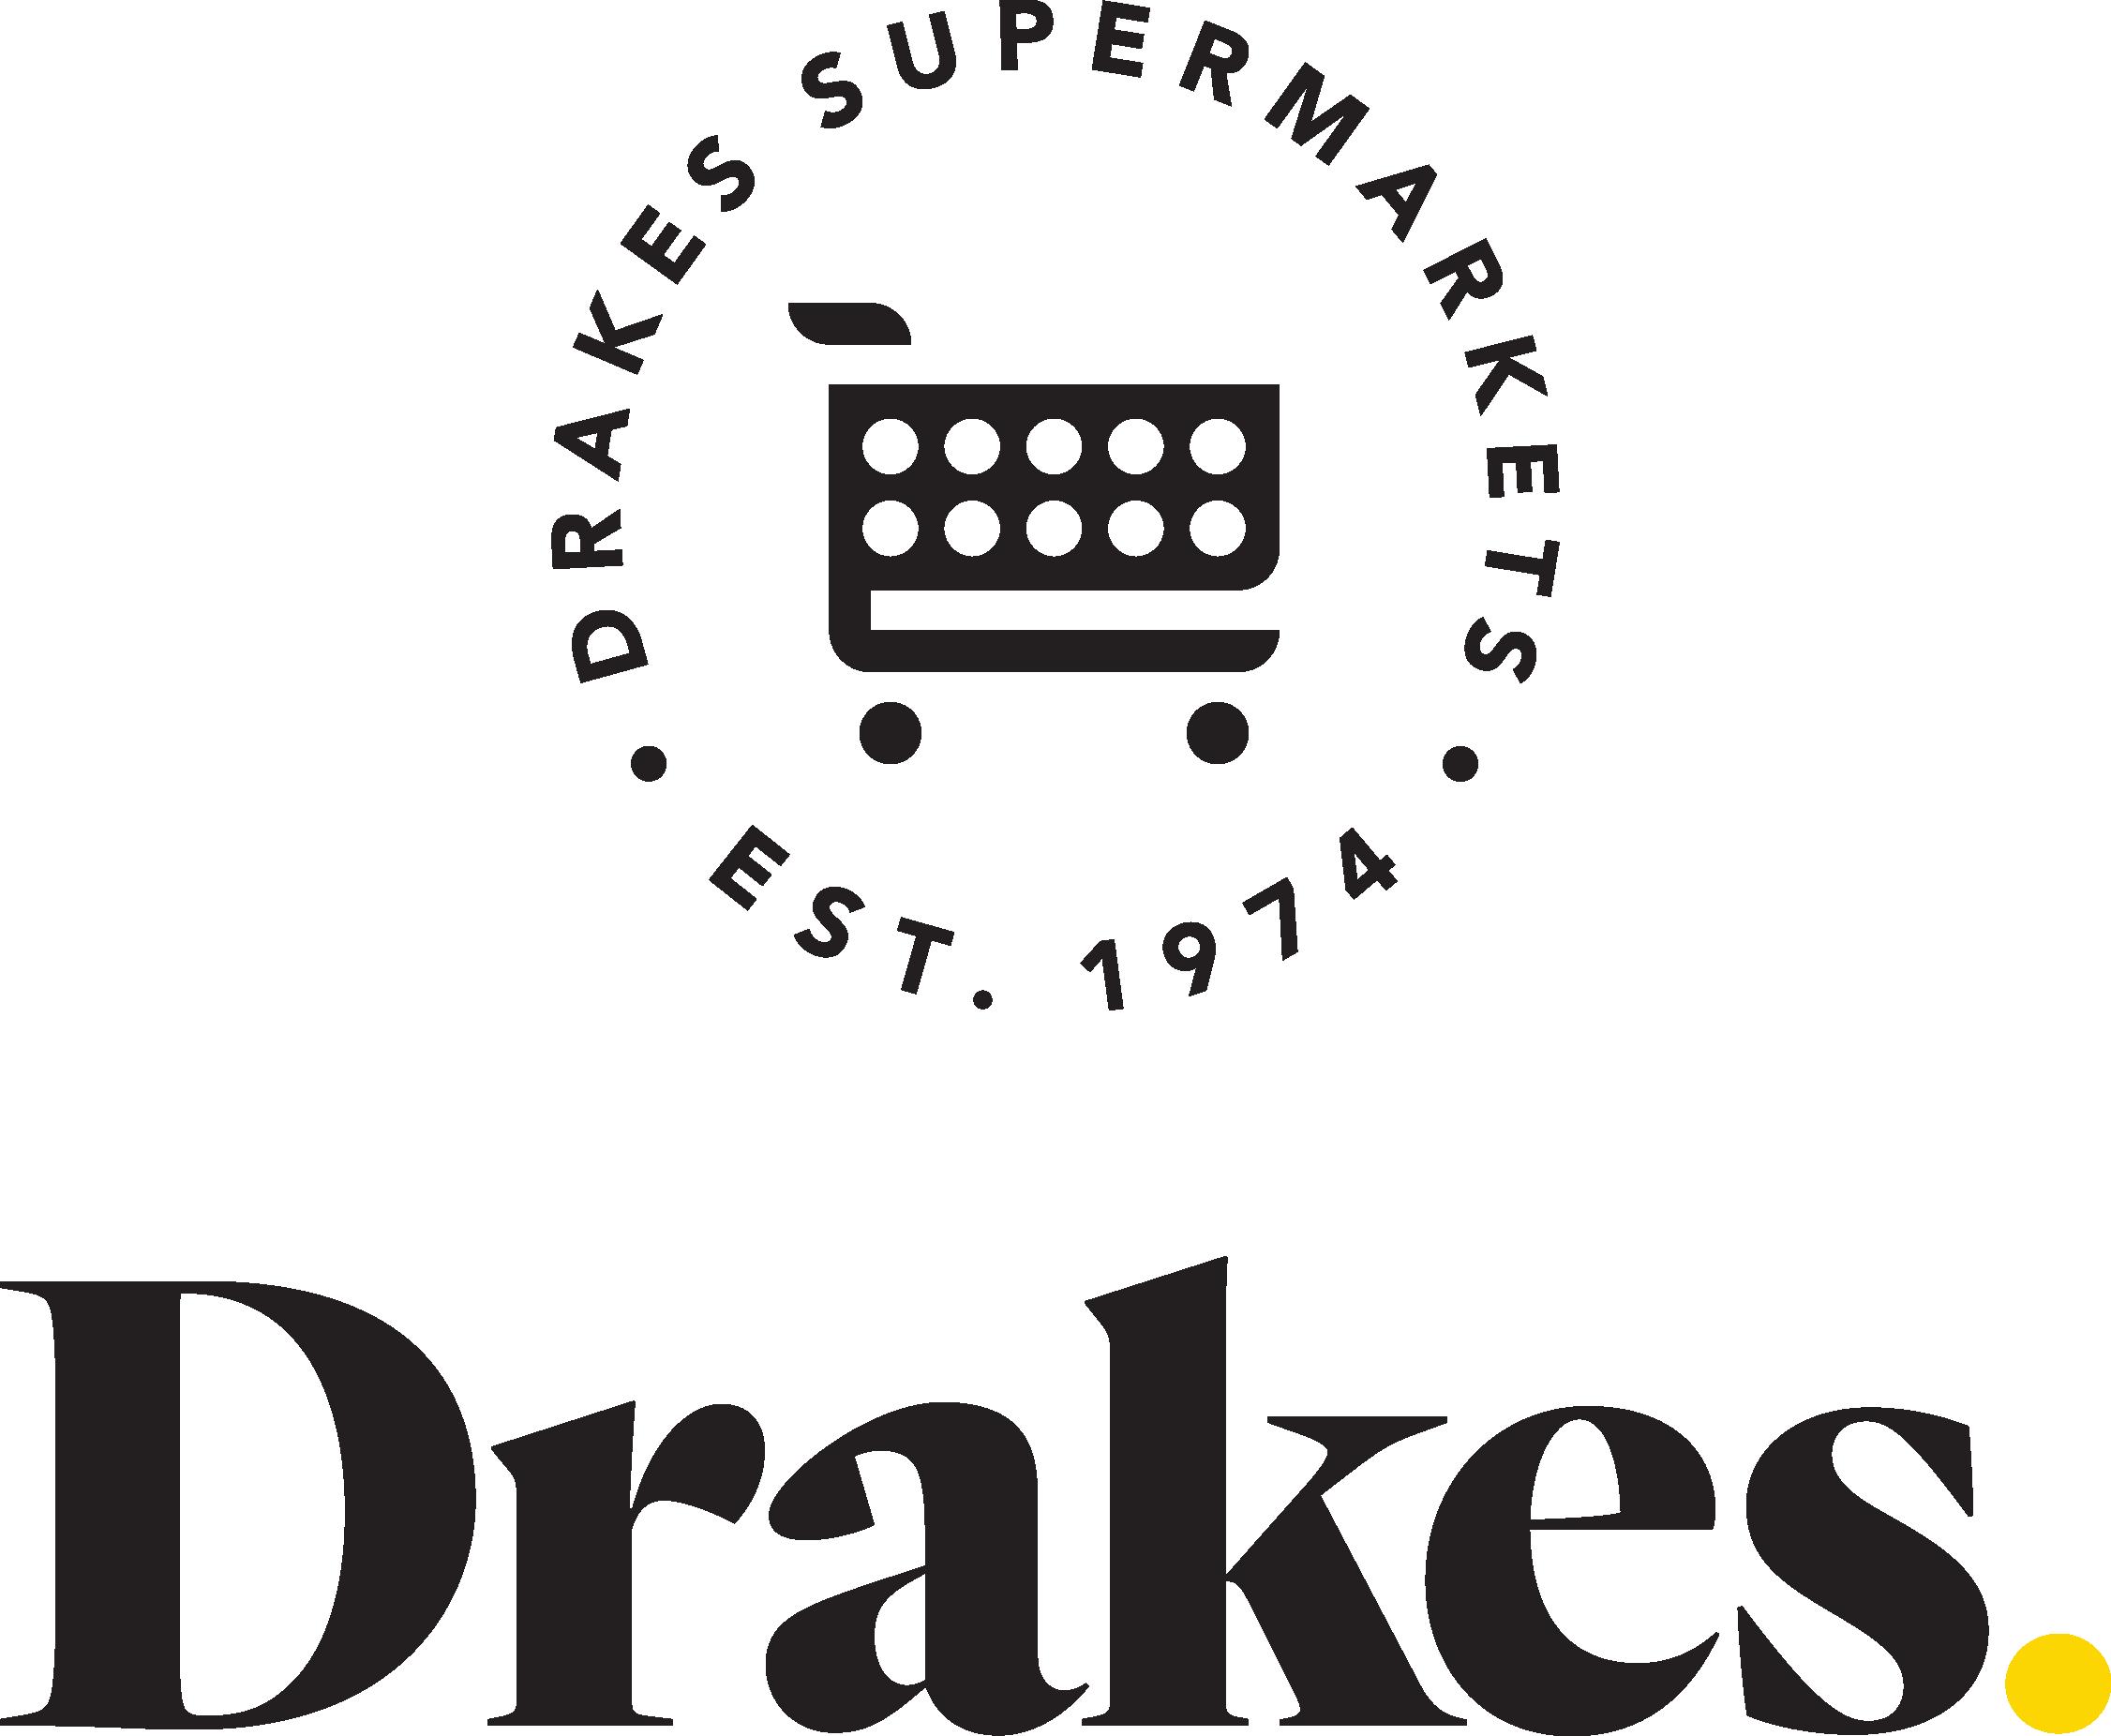 Drakes_Alternative_Colour_Stacked_Logo_Spot_Colour.